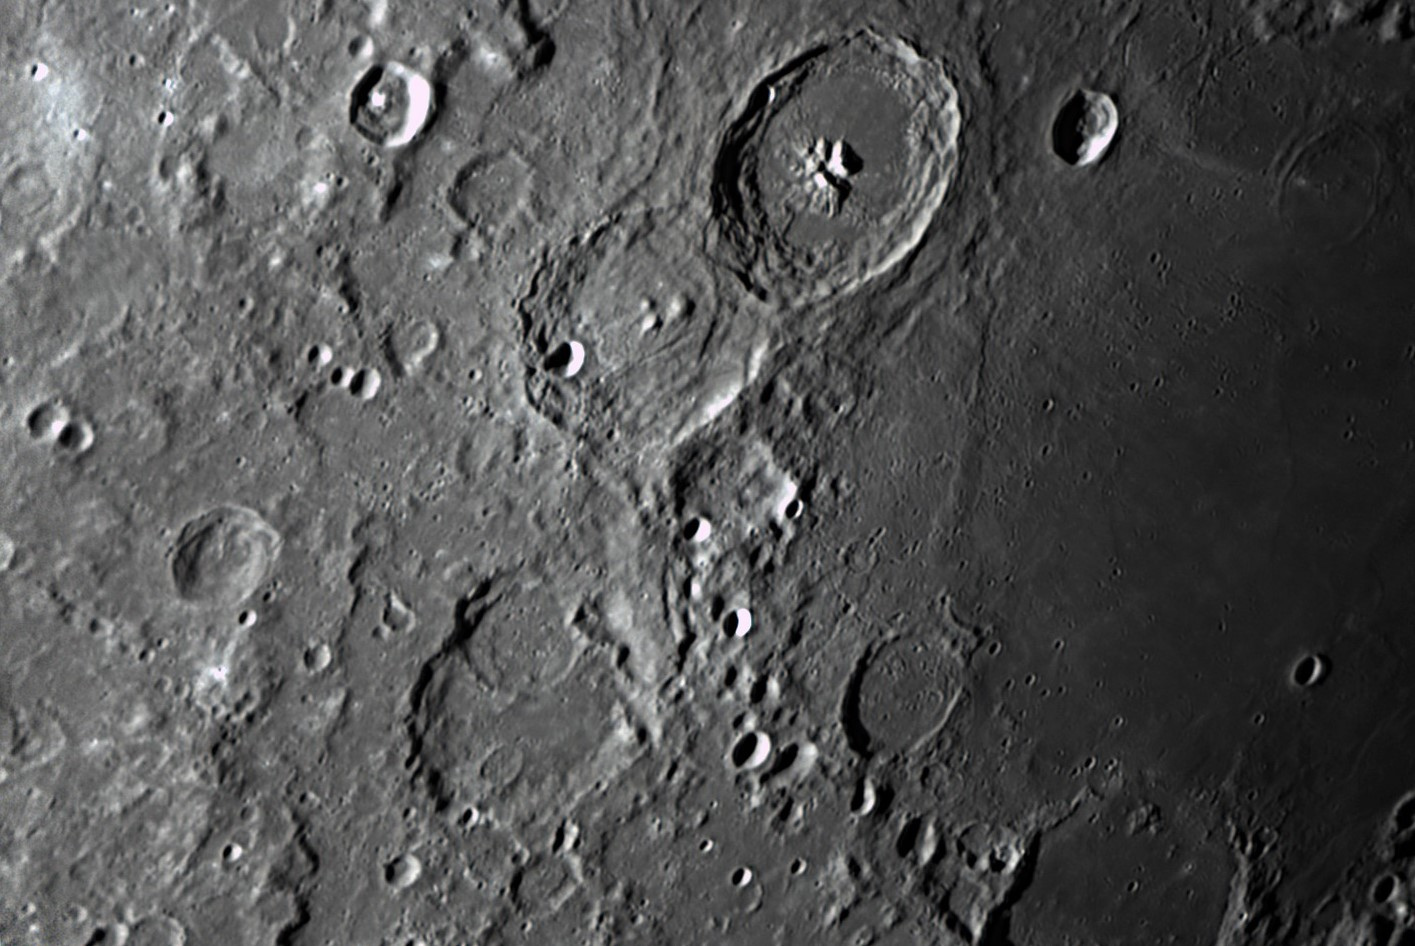 2019-09-18-0242_2-CapObj (2).jpg